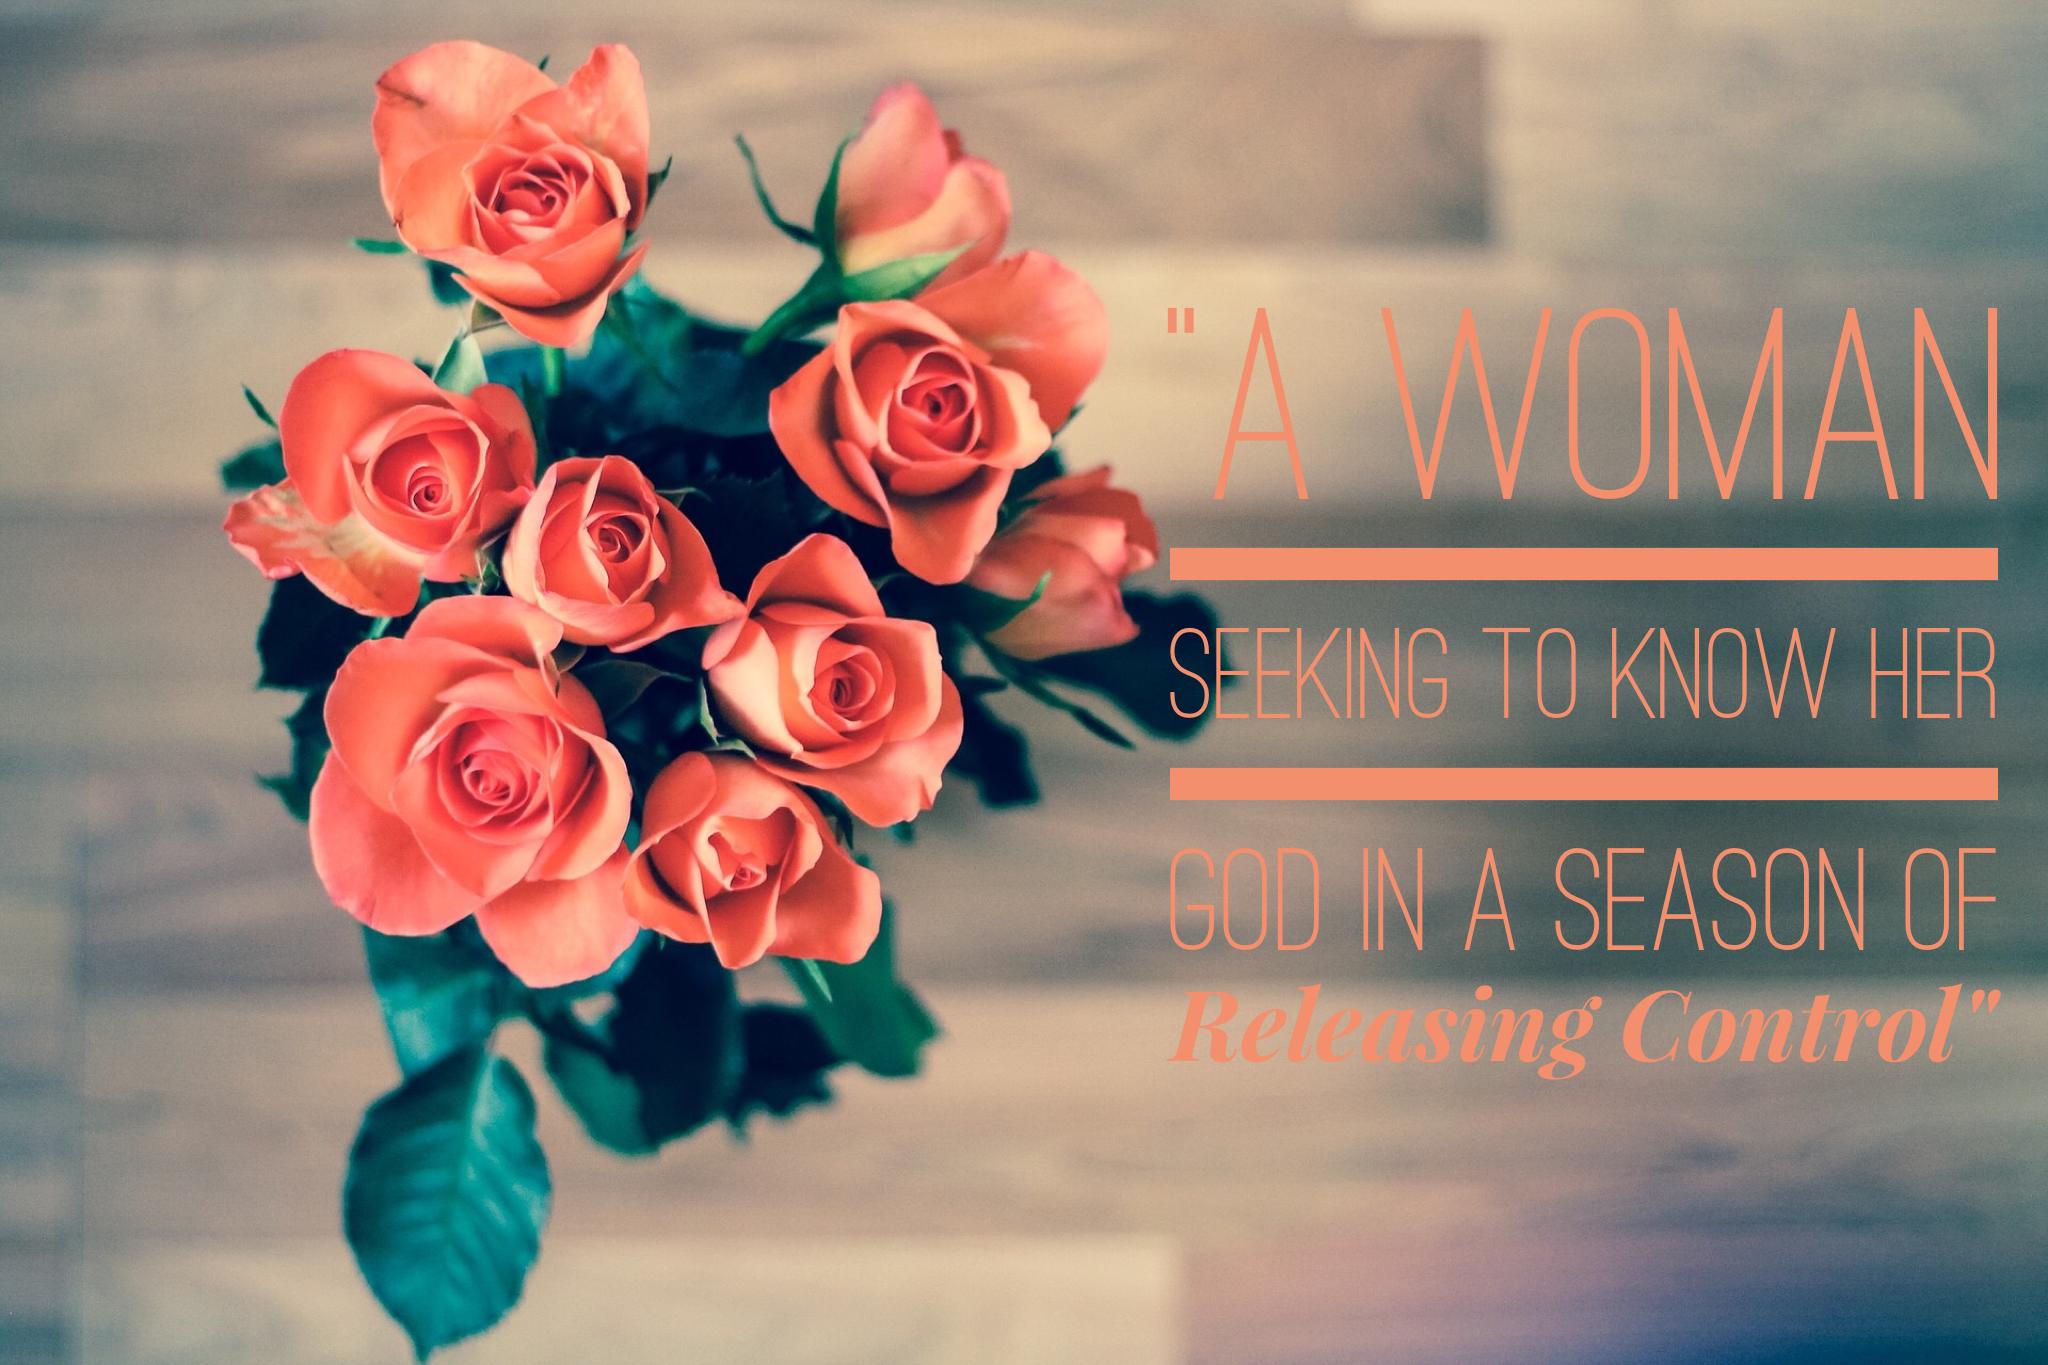 A Woman Seeking to Know Her God in a Season of Releasing Control | www.codyandras.com/blog/2017/8/24/season-of-releasing-control